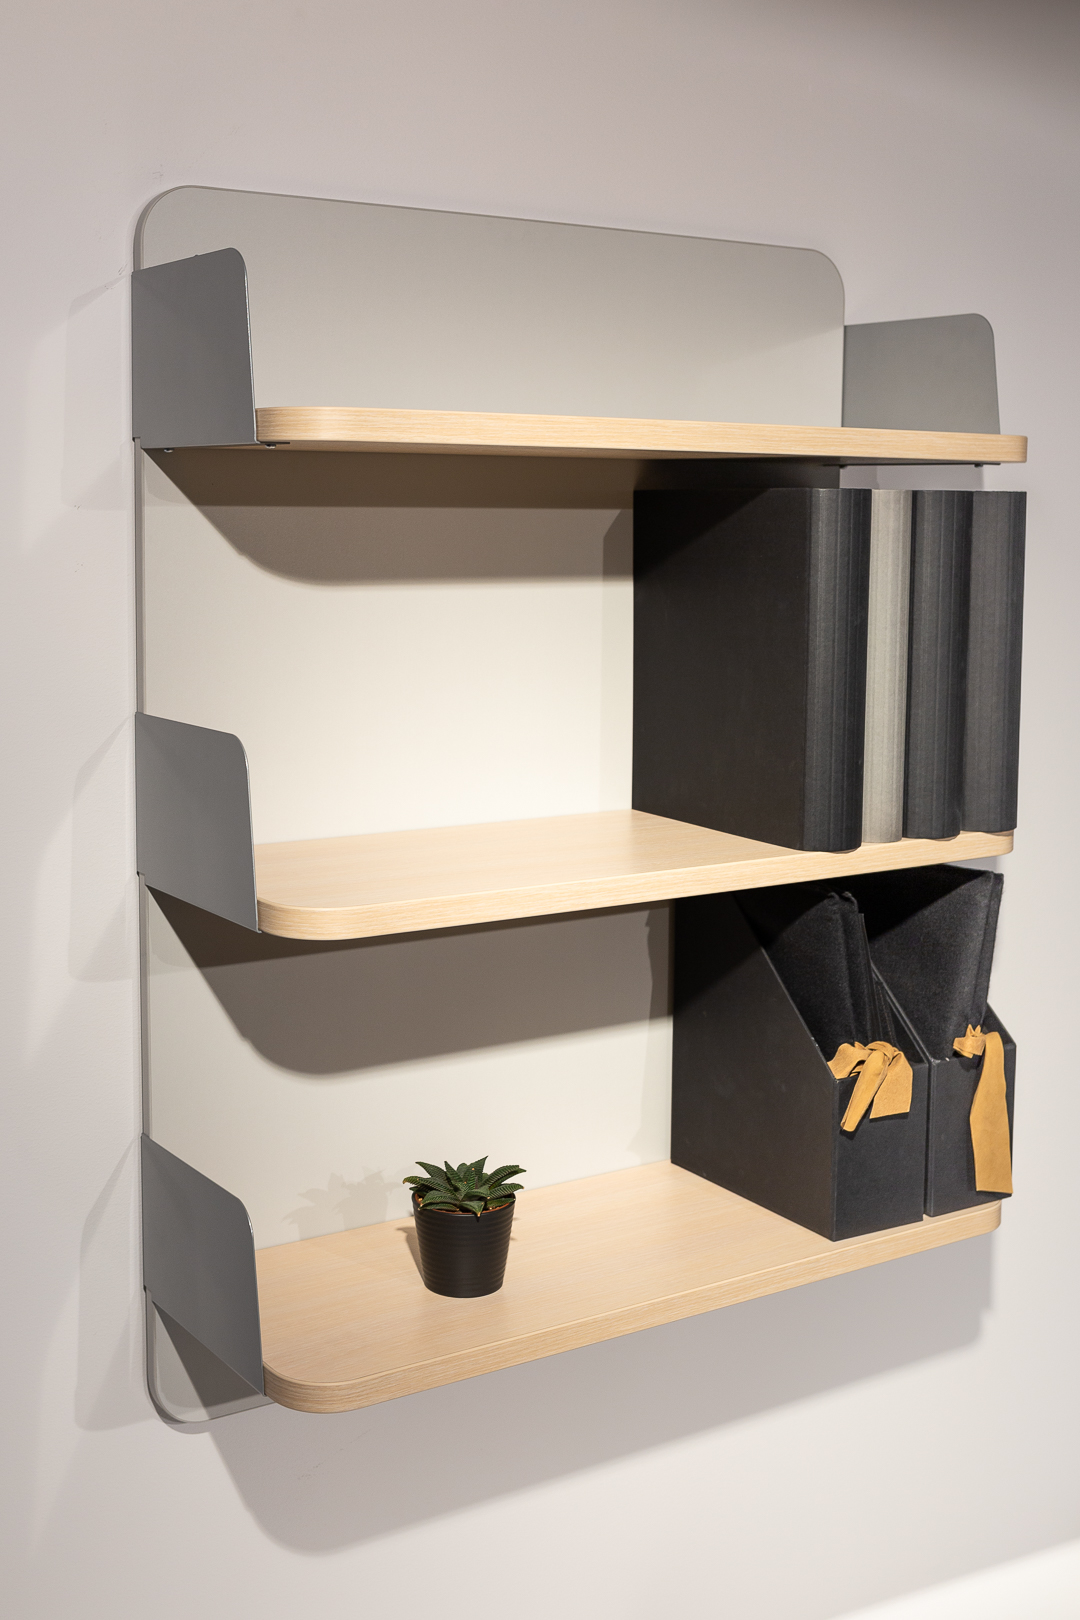 Wall panel shelf system